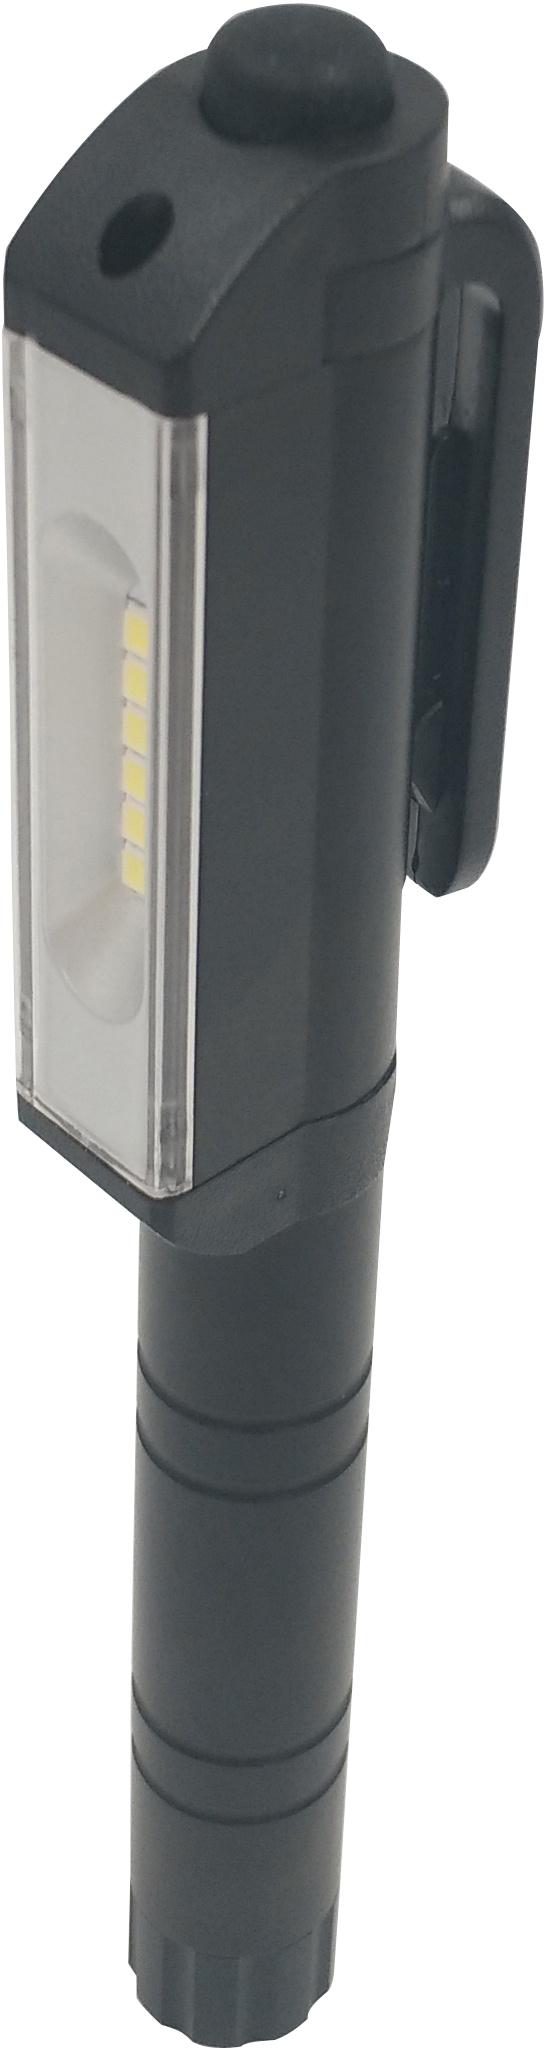 Looplamp BLD 3 6 Powerleds, clip met magneet incl. 3 AAA, 16 per display